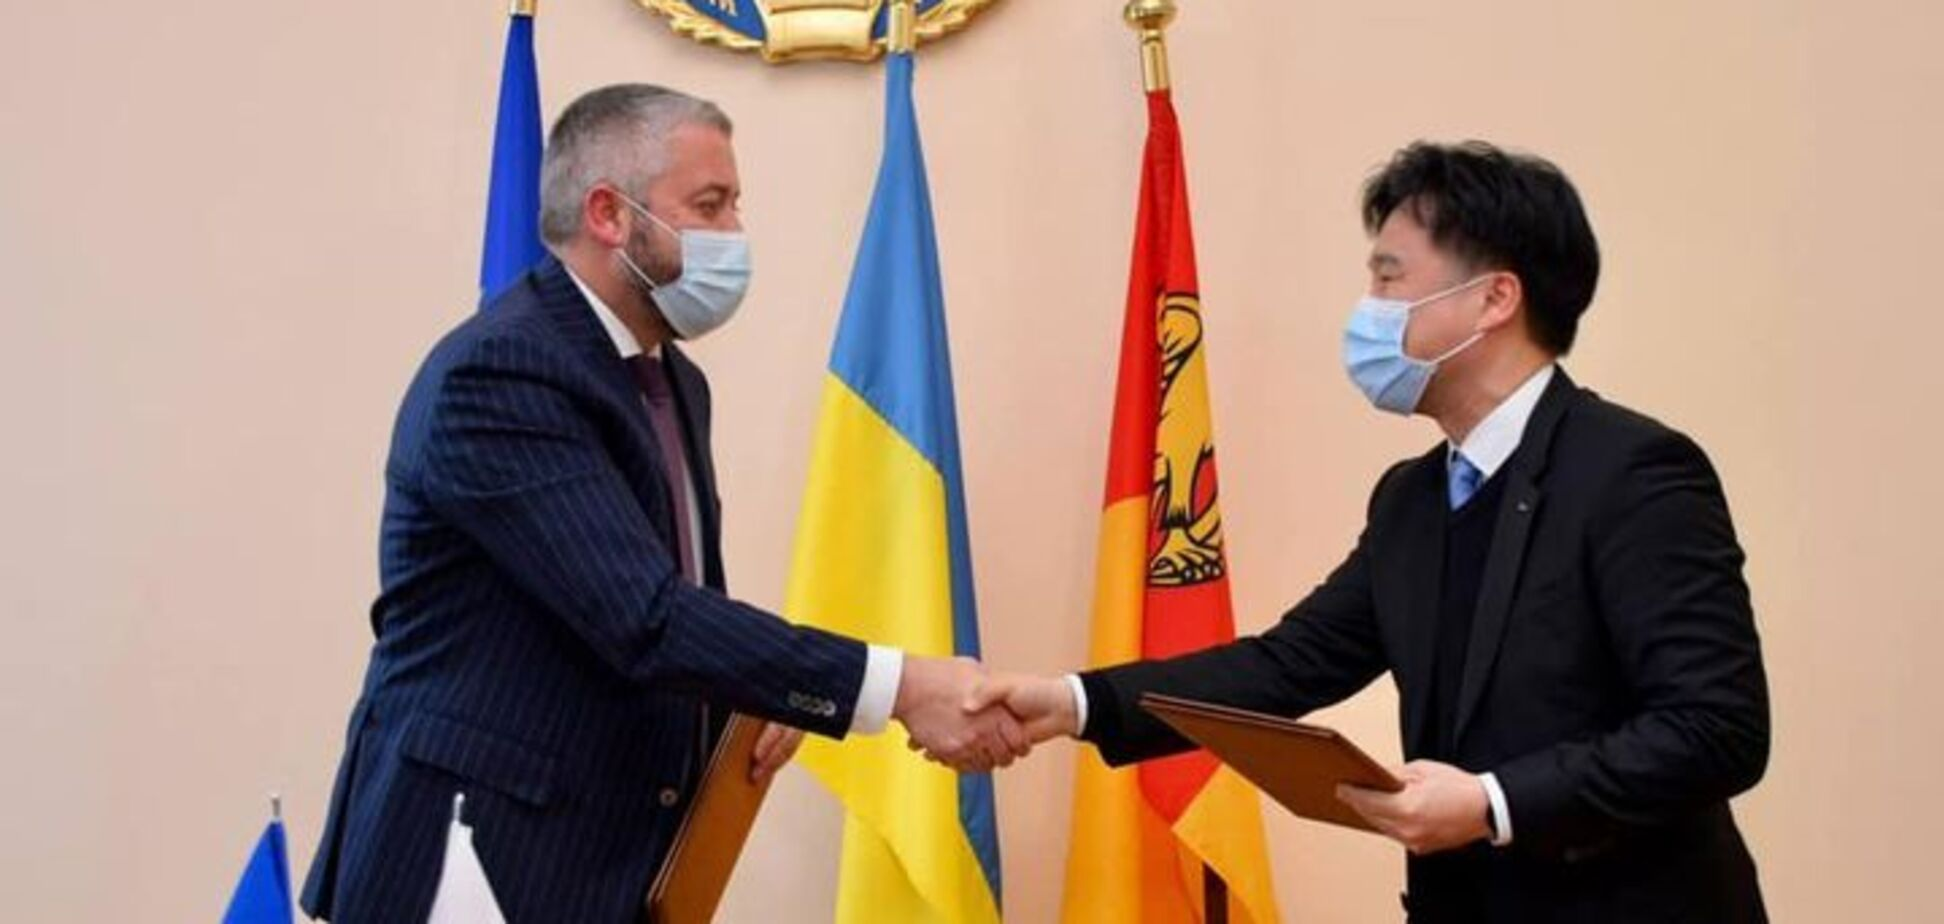 На Кировоградщину идут корейские инвестиции: подписан меморандум